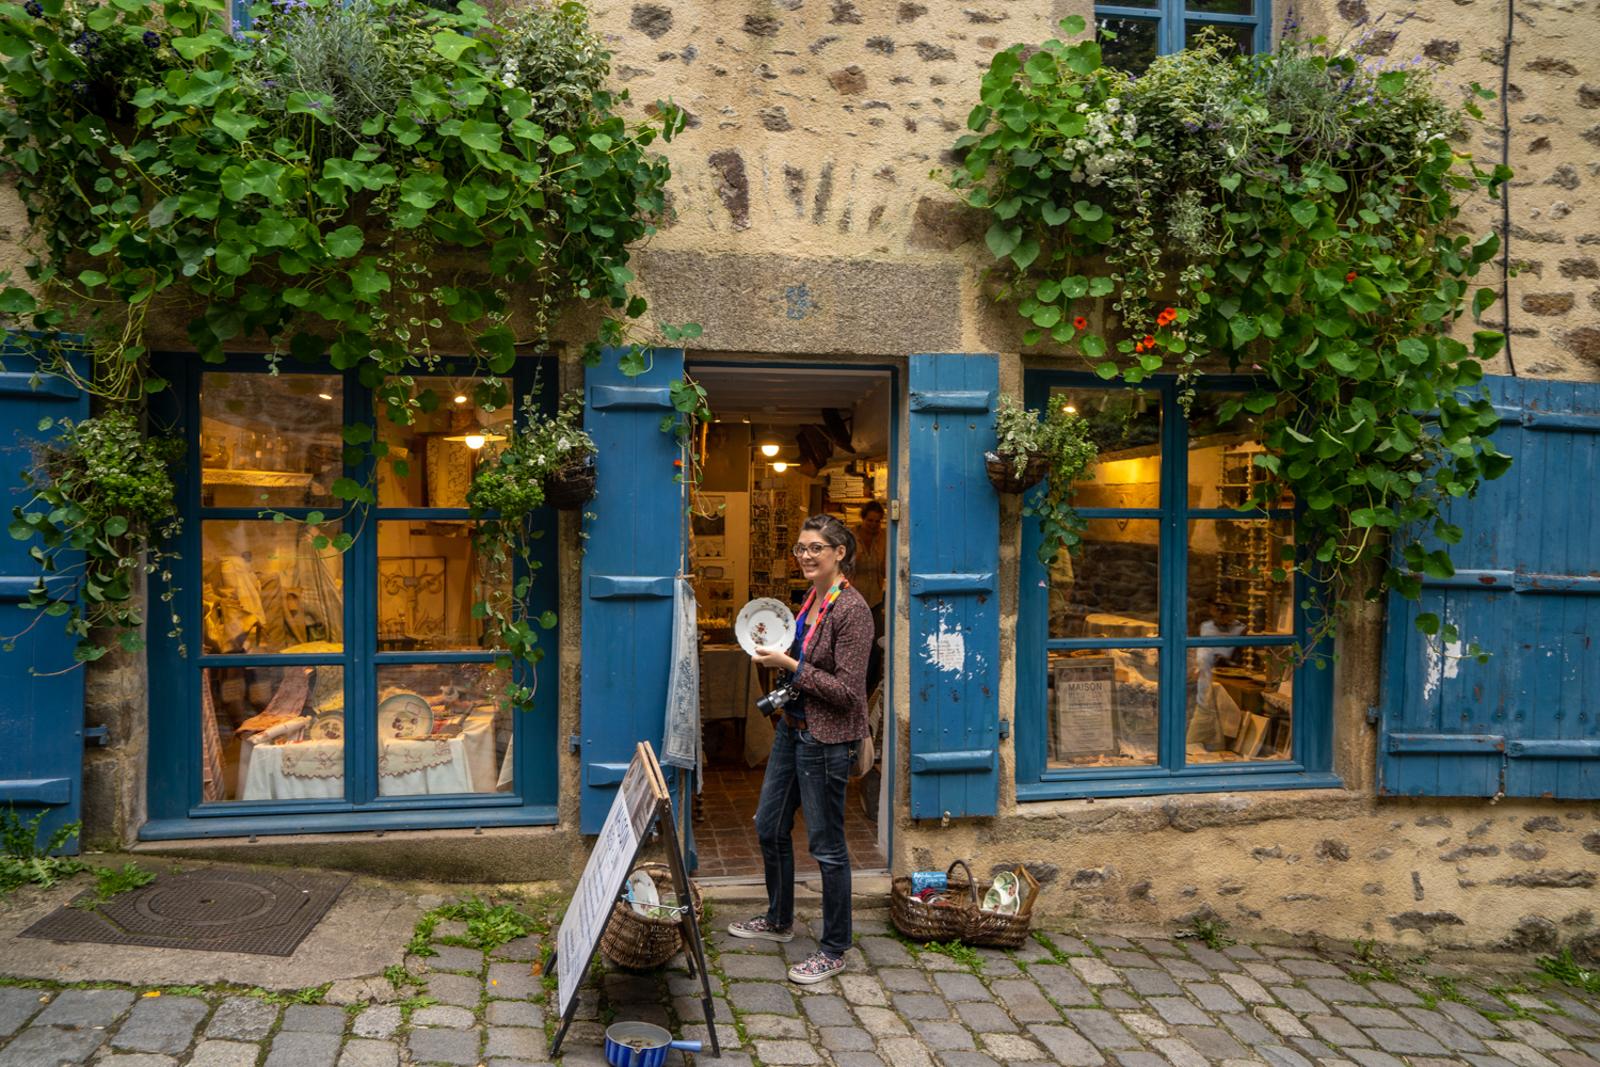 dinan, village bretagne, village vieilles pierres france, tourisme bretagne, tourisme france, village d'art